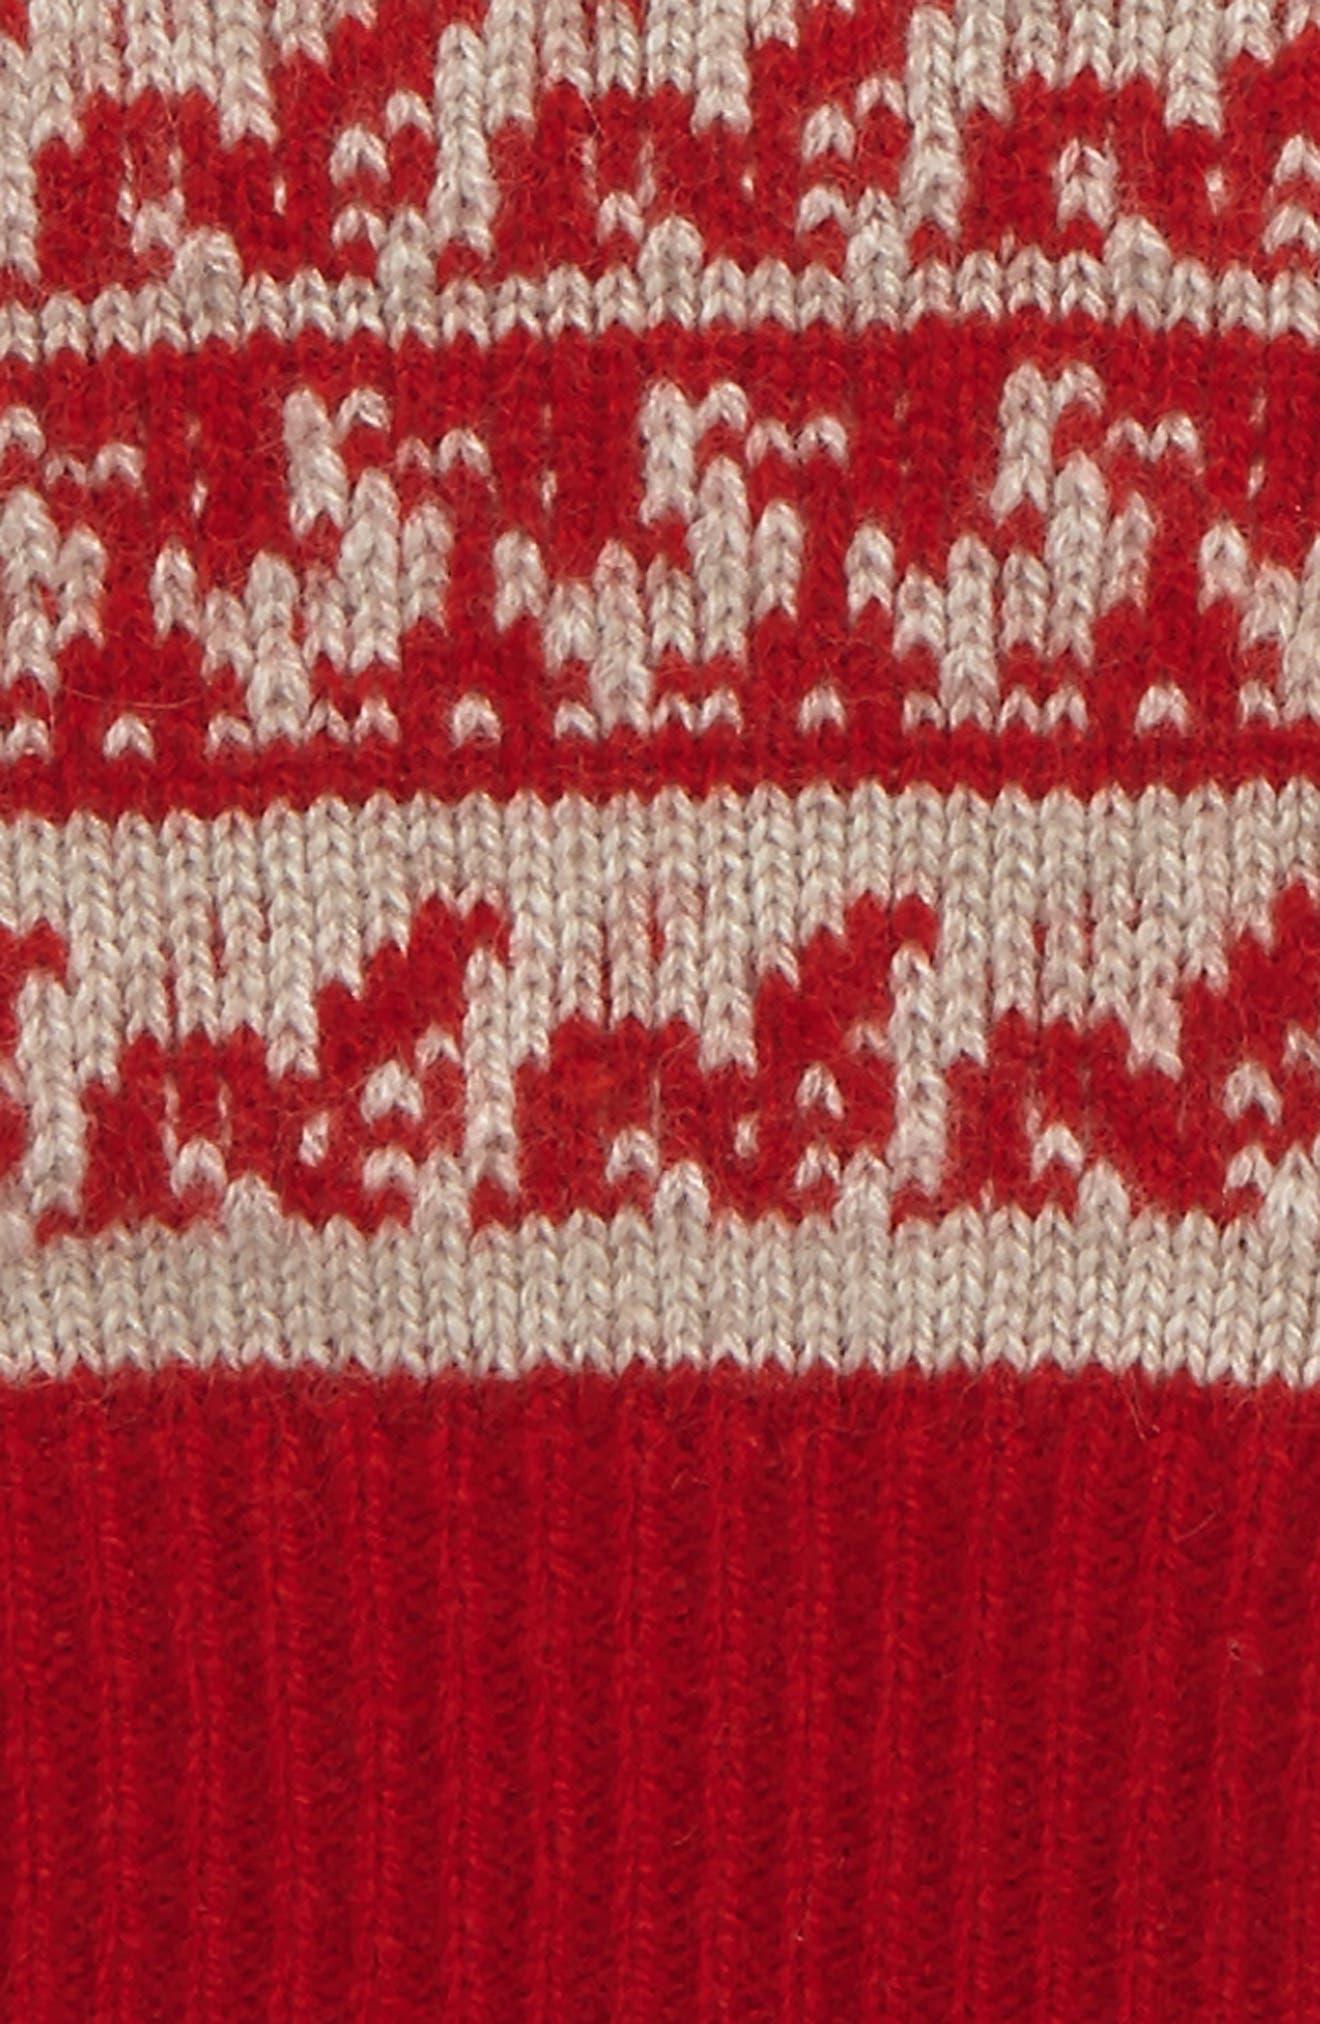 Fair Isle Cashmere & Wool Fingerless Gloves,                             Alternate thumbnail 2, color,                             Military Red